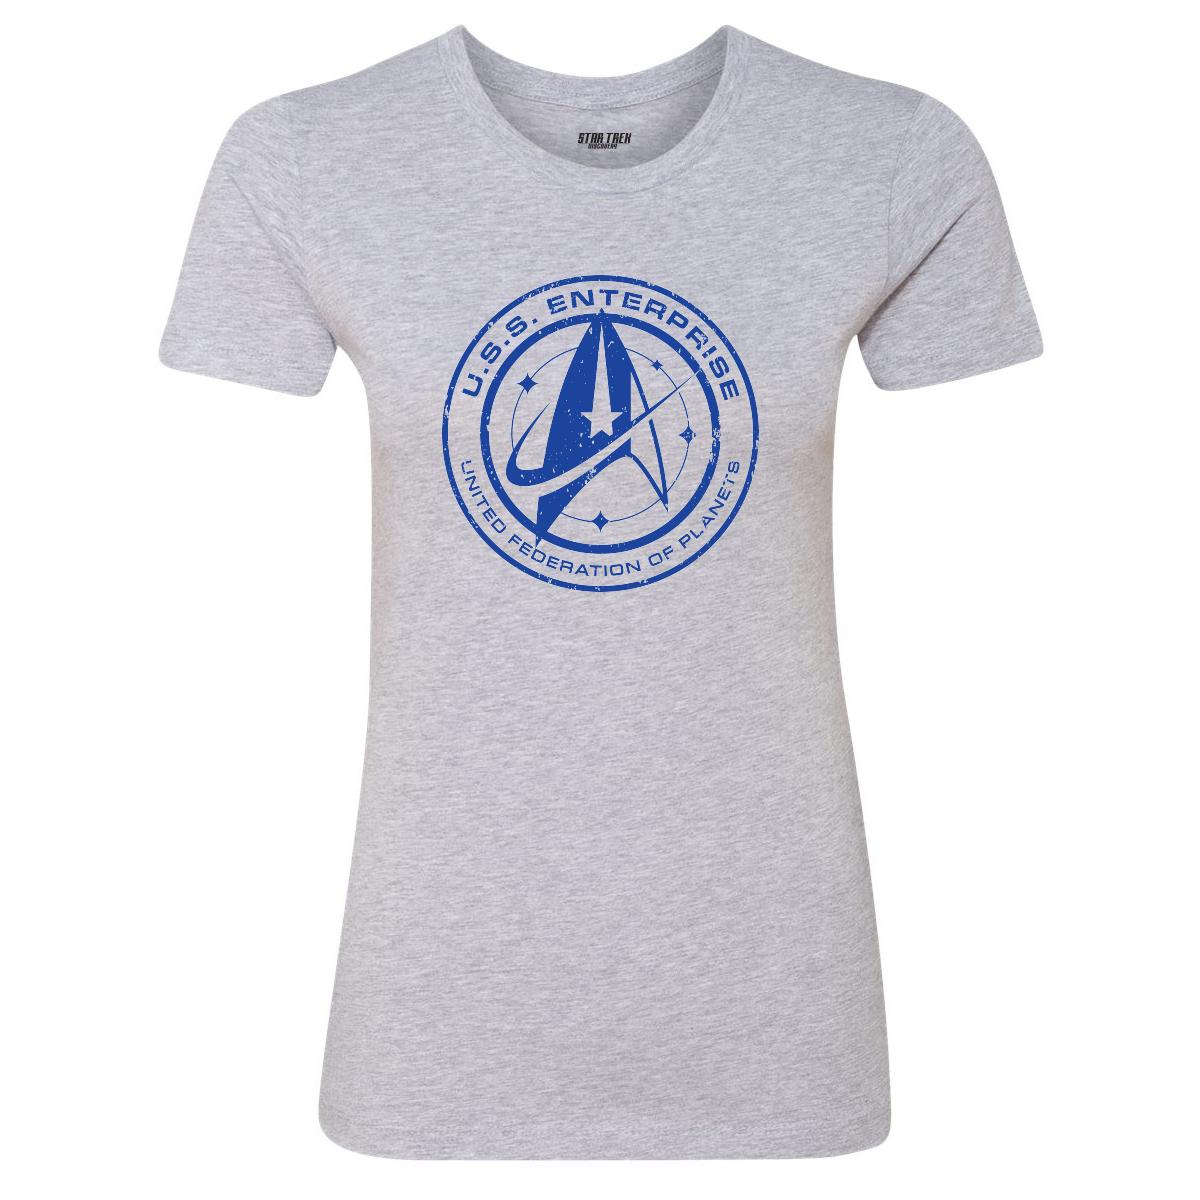 Star Trek Discovery U.S.S. Enterprise Women's T-Shirt